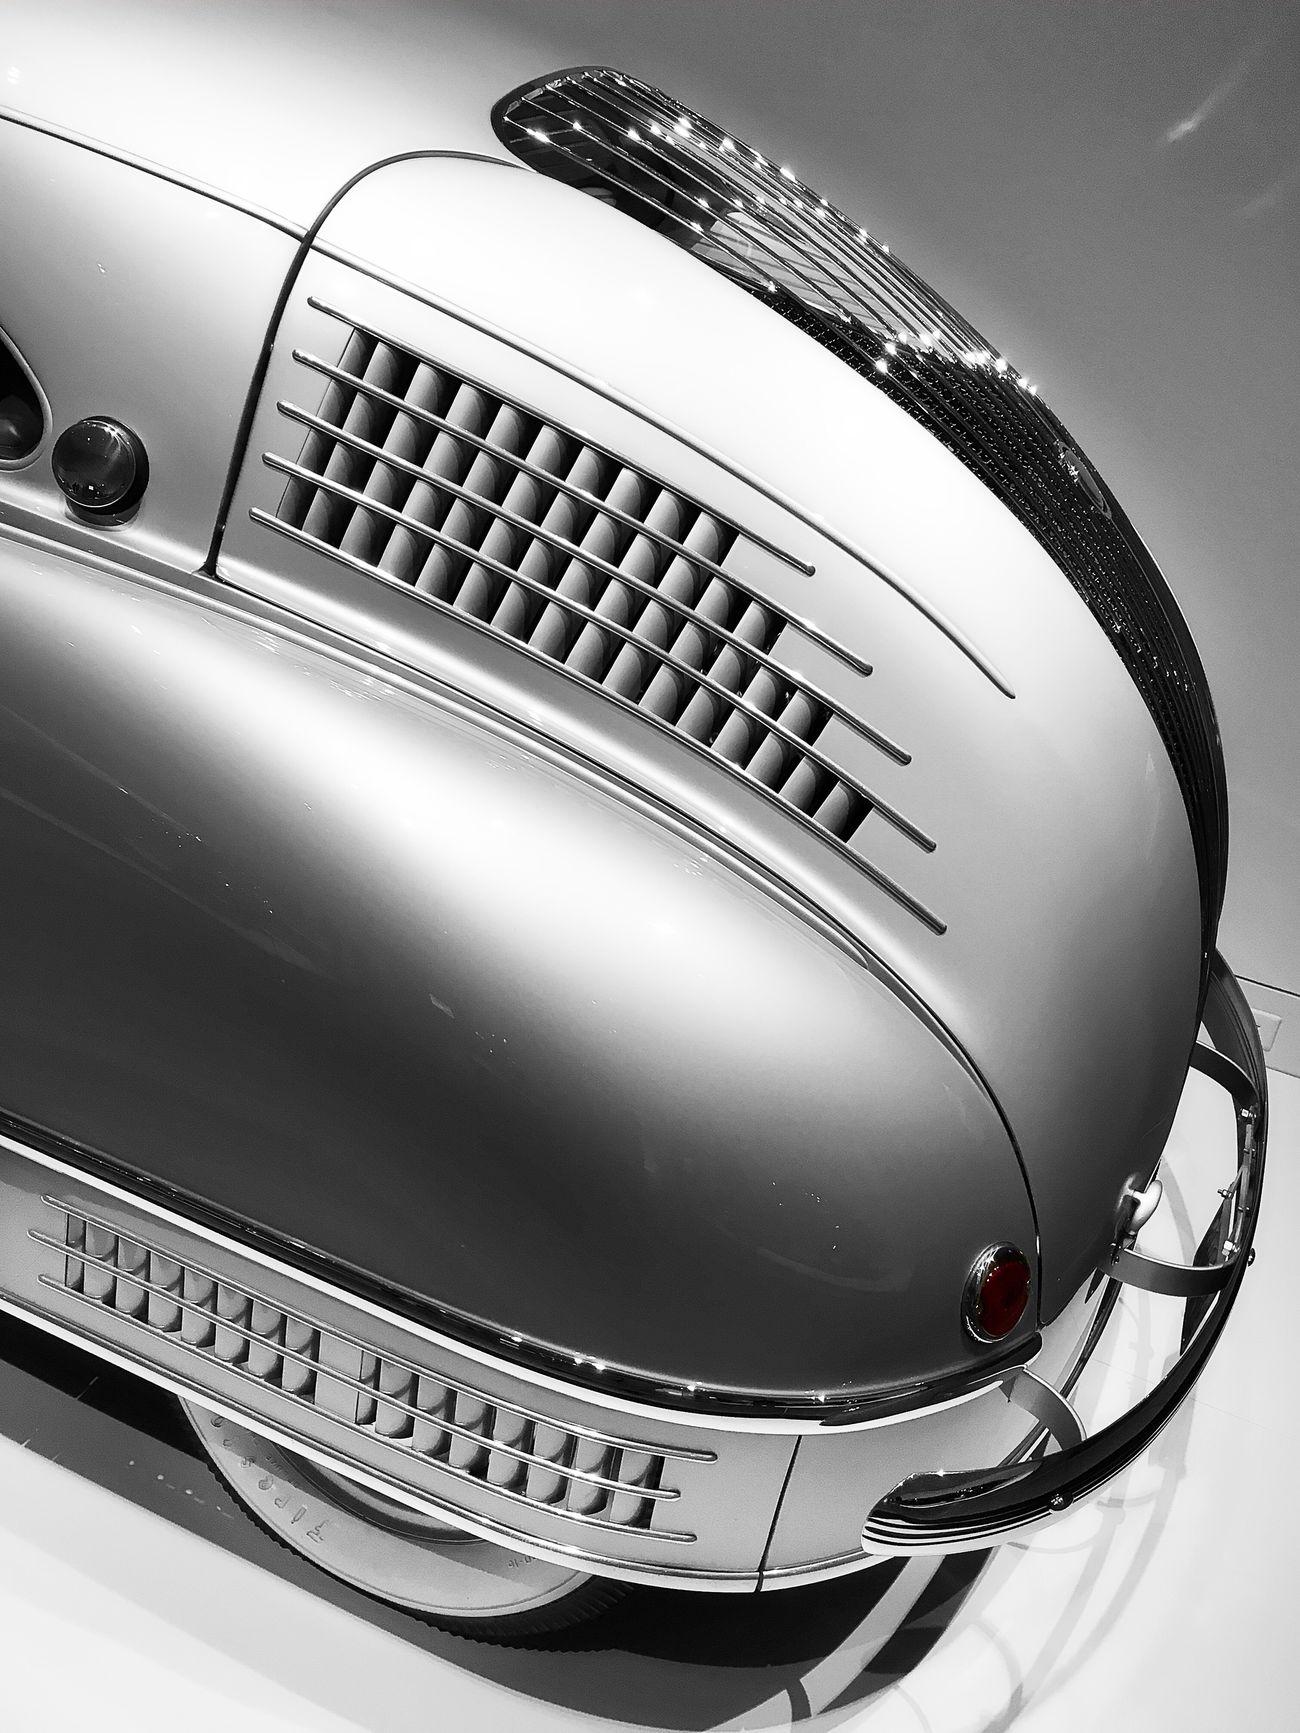 Sculpted Vintage Car Automobile Retro Car Industrial Design Streamlined Classic Art Deco Art Deco Design Sculpted Metal Sculpted In Steel Museum Piece Retro Retro Style EyeEmNewHere EyeEm Best Shots Wheels Chrome Collector's Car Retro Styled Vintage Silver  Classic Car Car Transportation